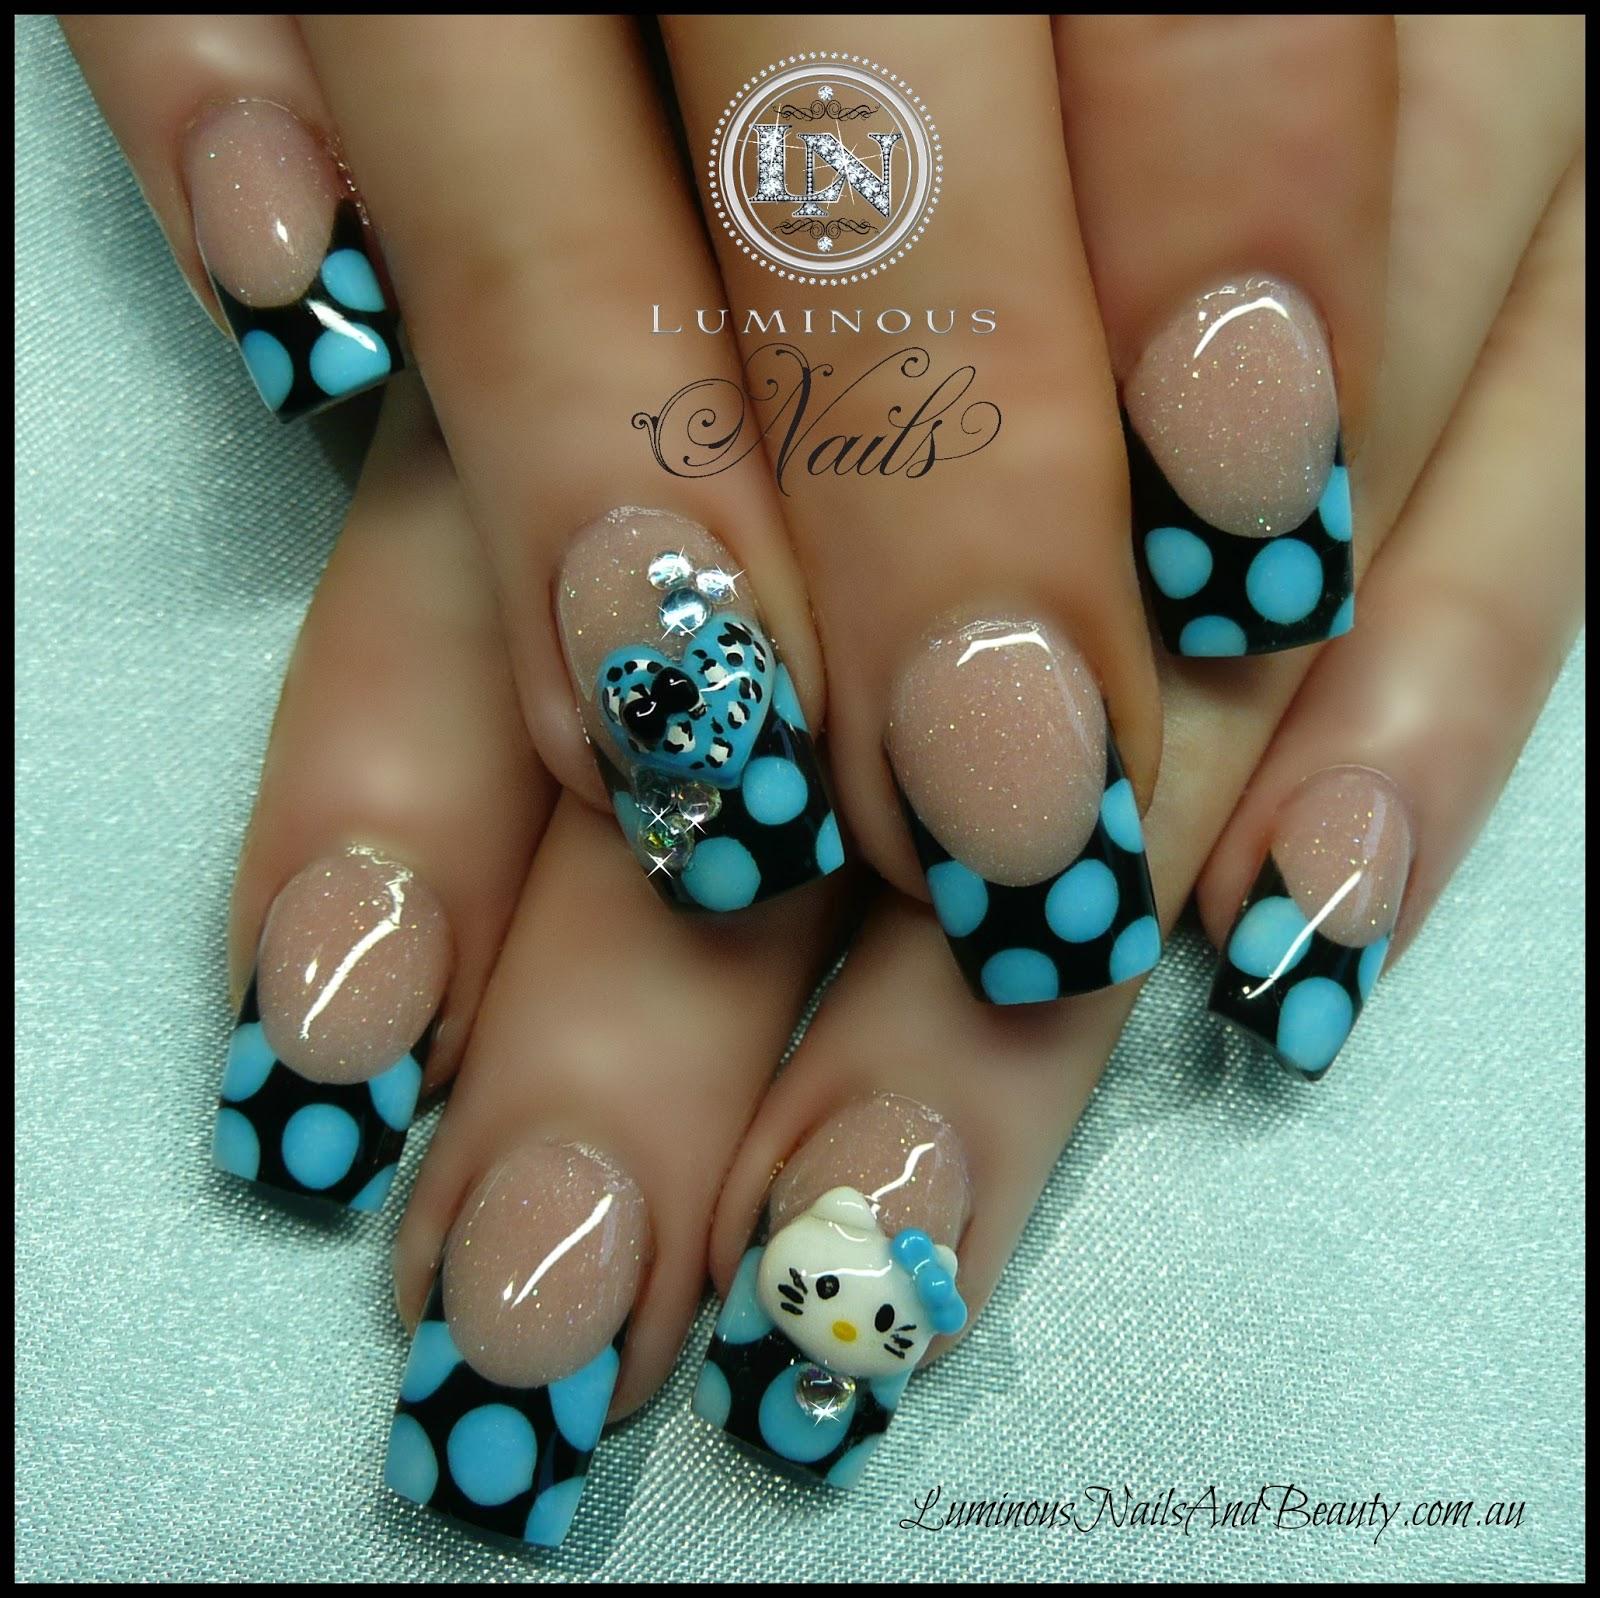 http://3.bp.blogspot.com/-iRopOpnkSxM/UKtMjIn5OsI/AAAAAAAAAVQ/nf3CrZKqG1U/s1600/Luminous+Nails+And+Beauty,+Gold+Coast+Queensland.+Acrylic+Nails,+Gel+Nails,+Sculptured+acrylic+nails+with+Neon+Blue+Polka+Dots,+3D+Hello+Kitty,+&+Leopard+Print+Heart.+.jpg Cute Hello Kitty Acrylic Nails